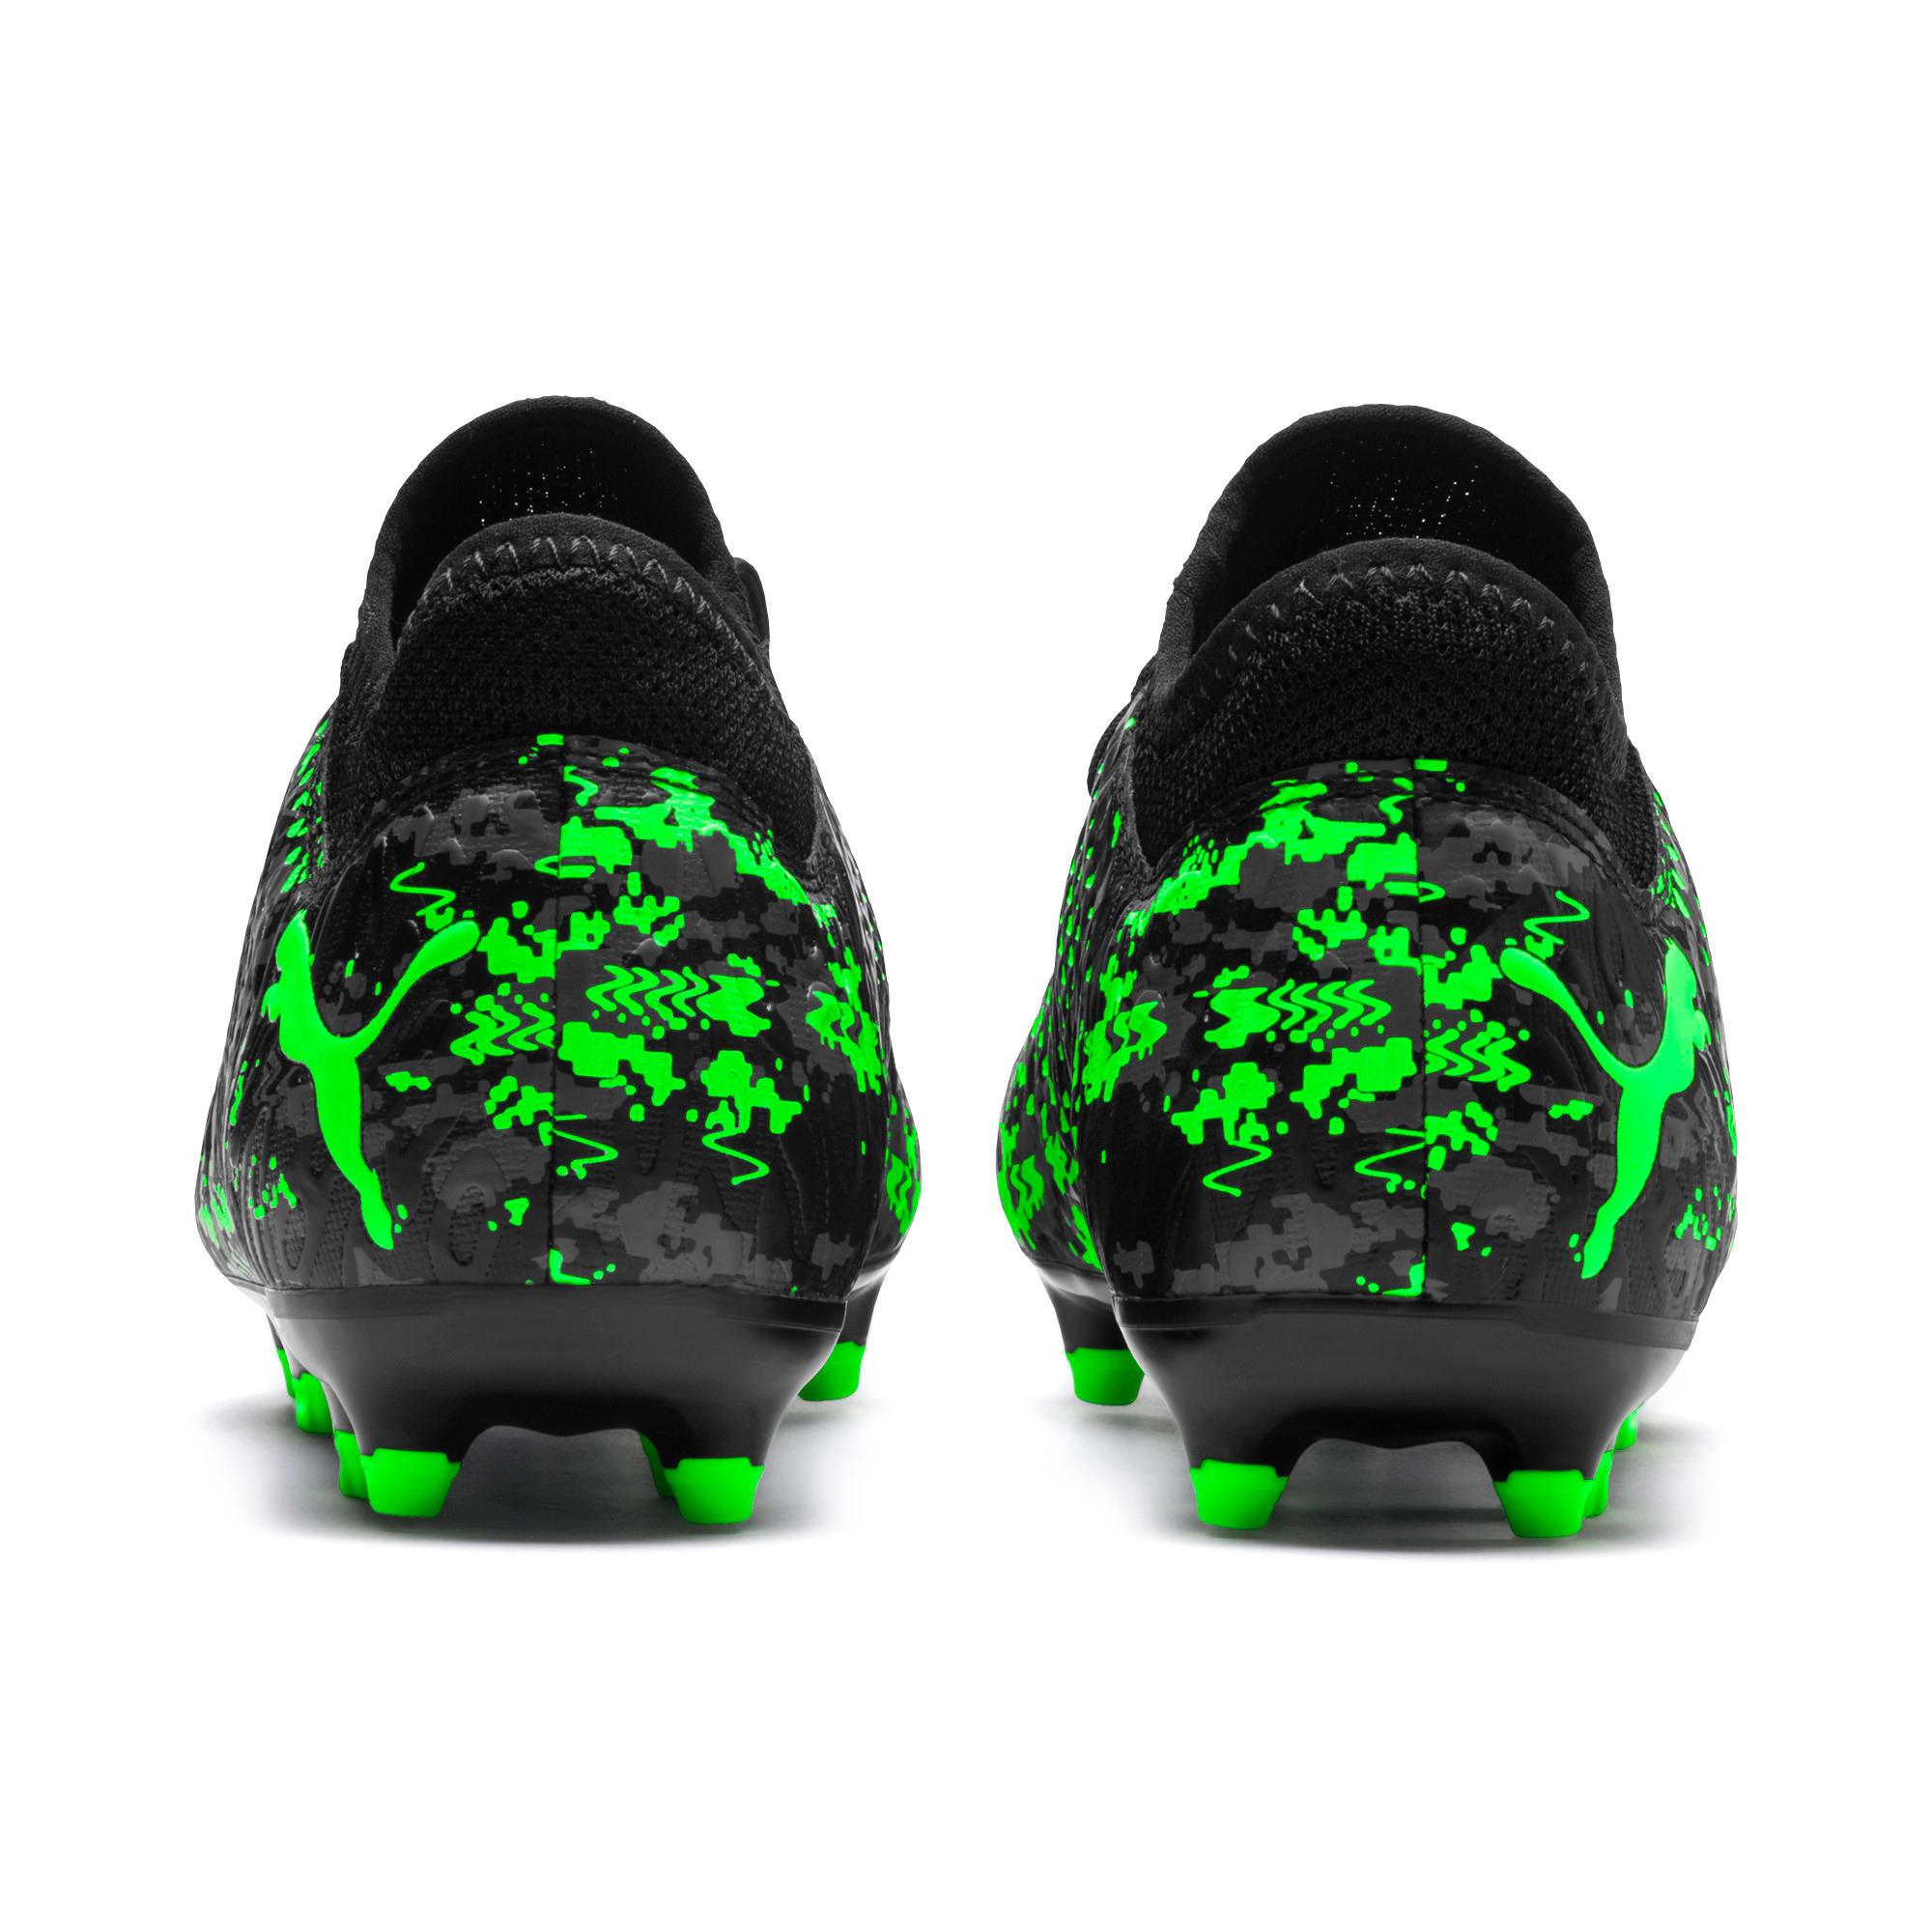 Thumbnail 3 of FUTURE 19.4 FG/AG Youth Football Boots, Black-Gray-Green Gecko, medium